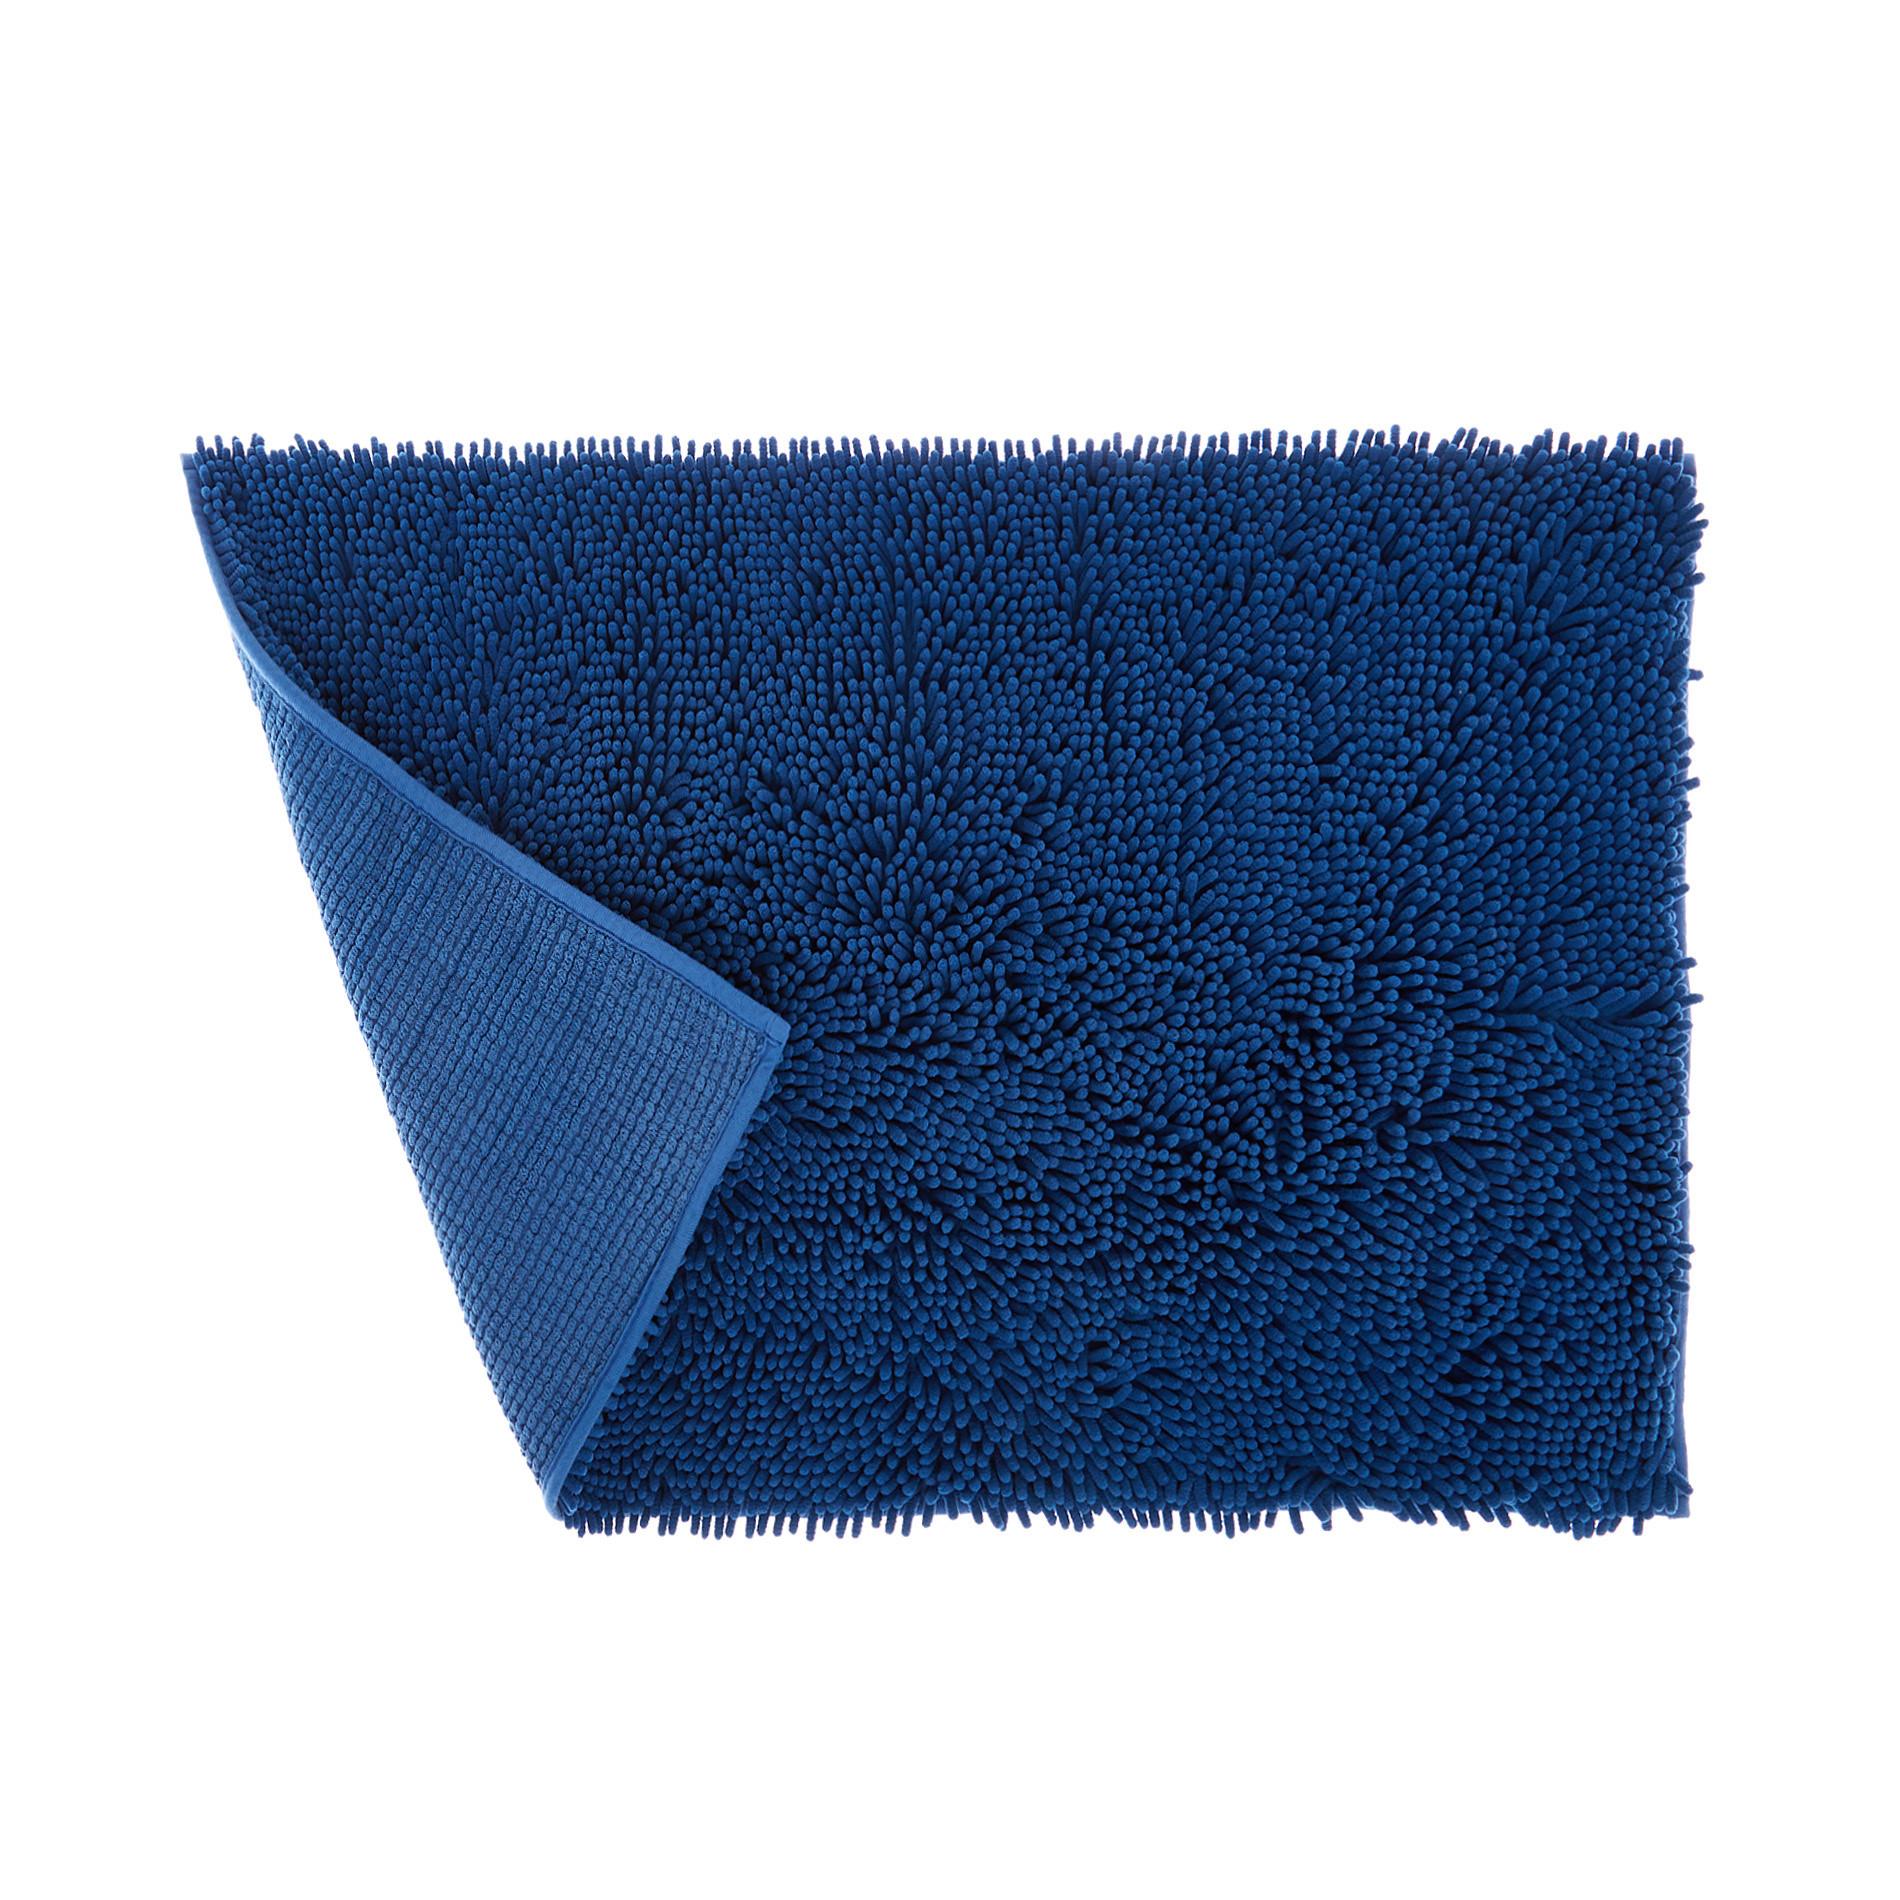 Tappeto bagno microfibra shaggy, Blu, large image number 1